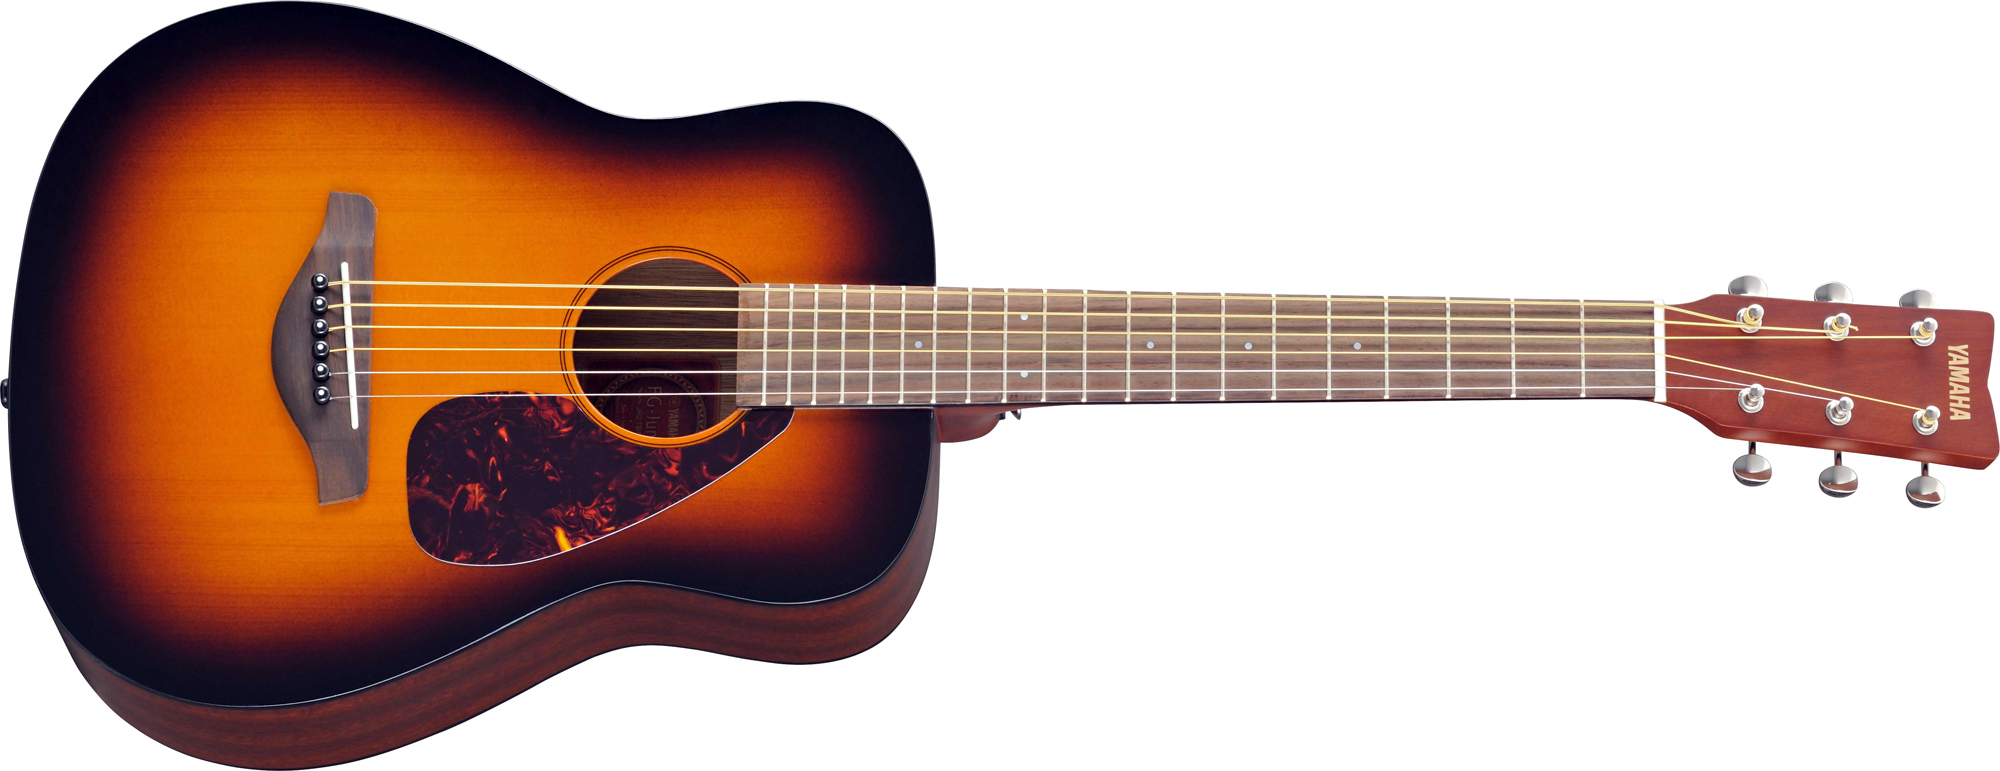 Yamaha jr2tbs 3 4 junior acoustic guitar in tobacco sunburst for Where are yamaha guitars made